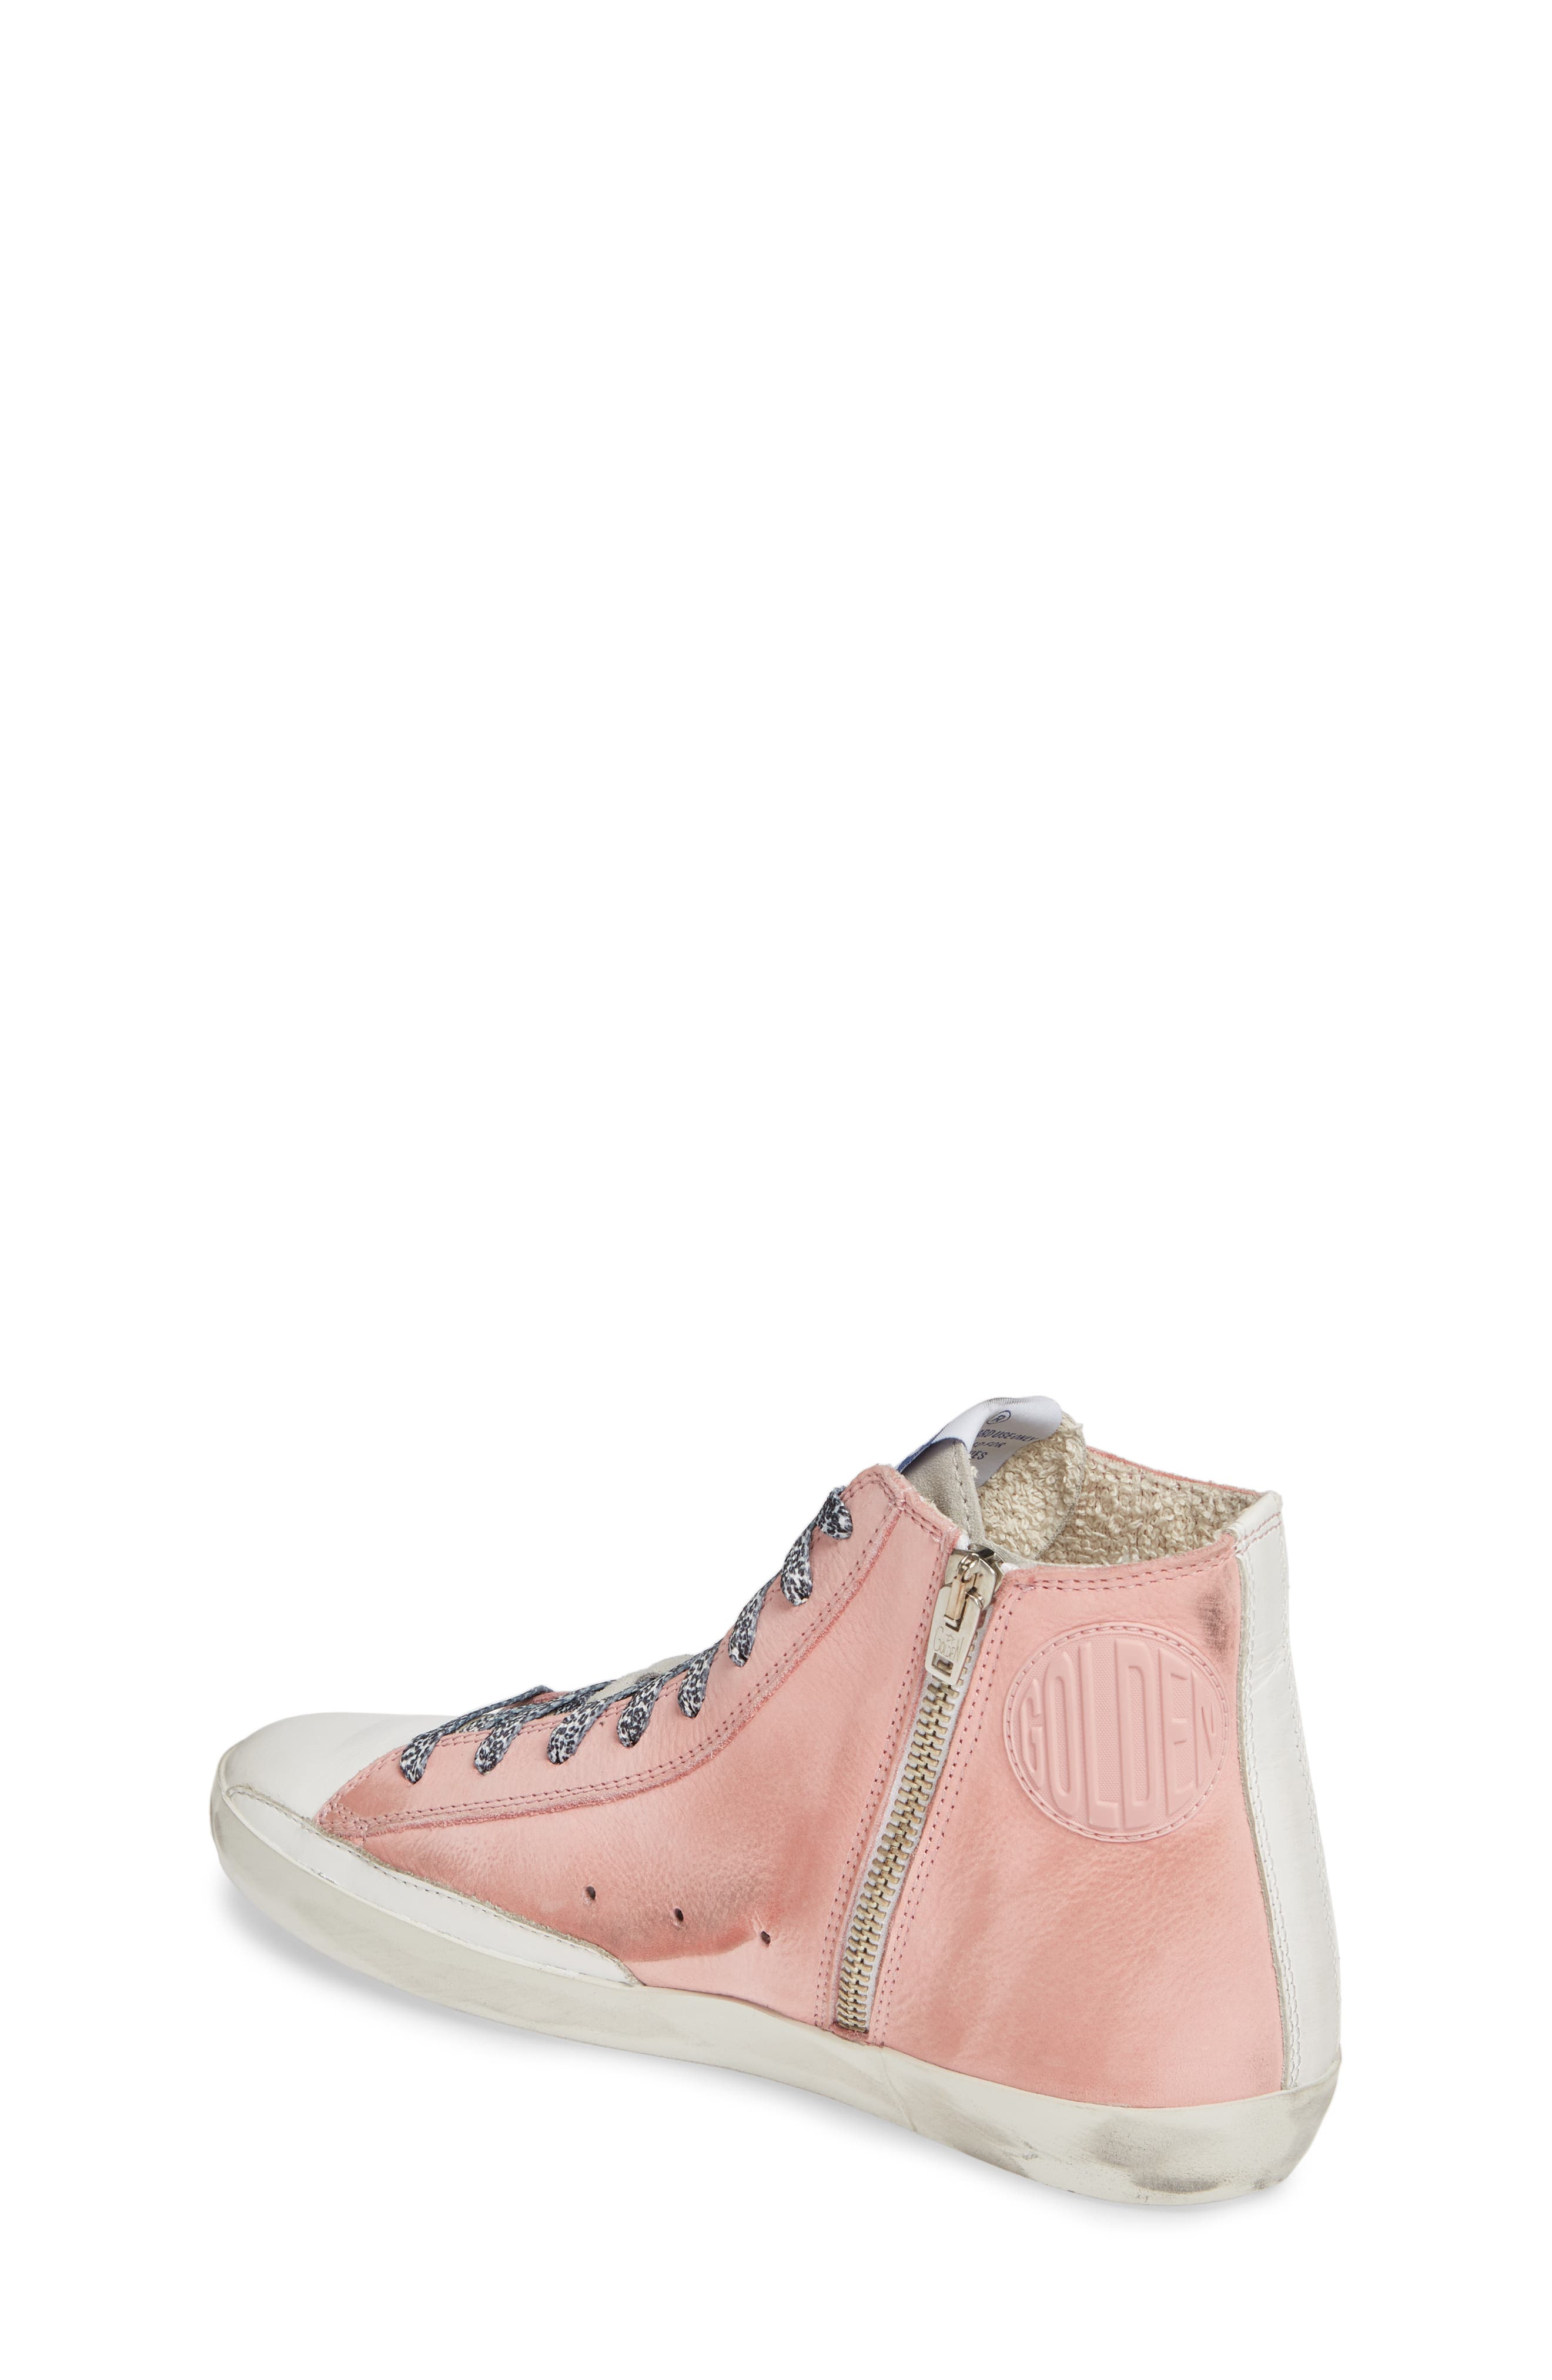 GOLDEN GOOSE, Francy High Top Sneaker, Alternate thumbnail 2, color, PINK PEONY